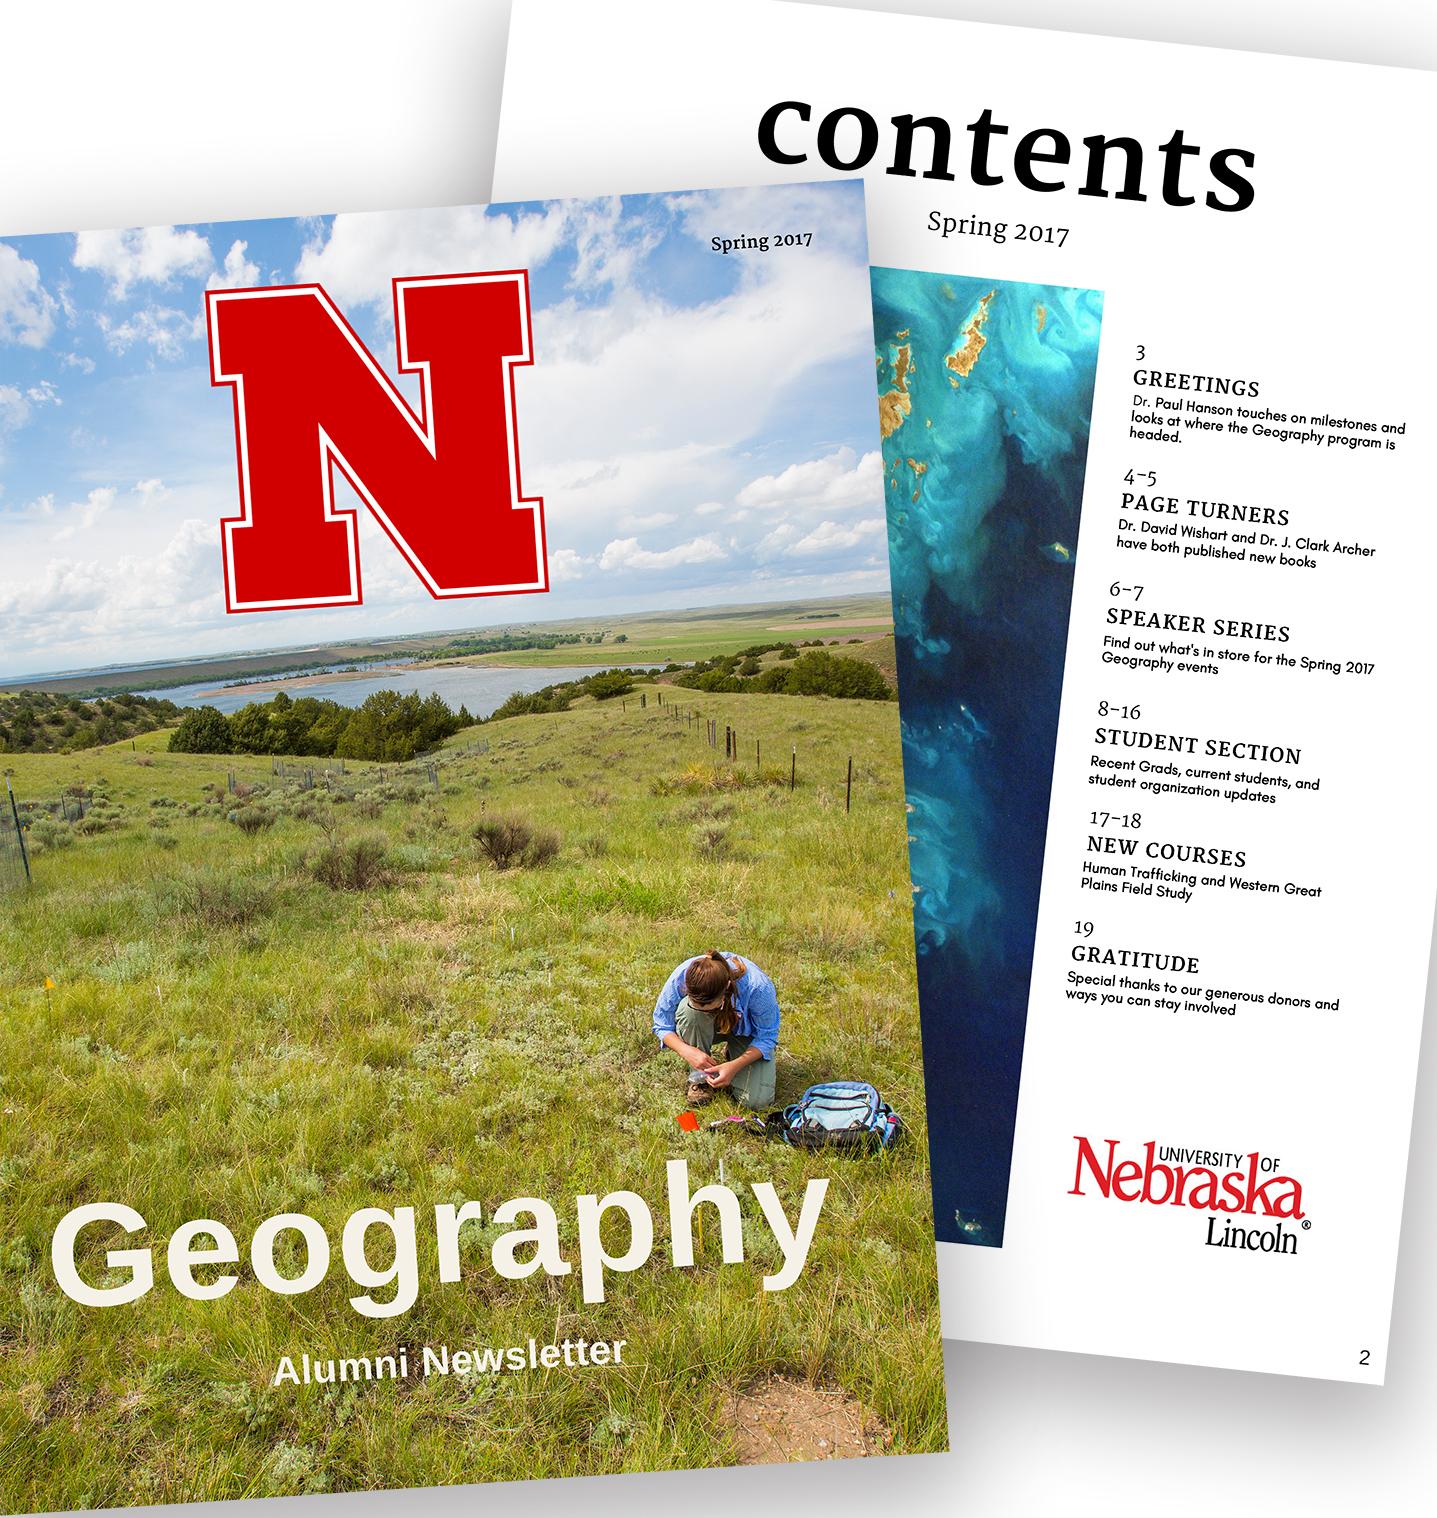 Geography alumni newsletter